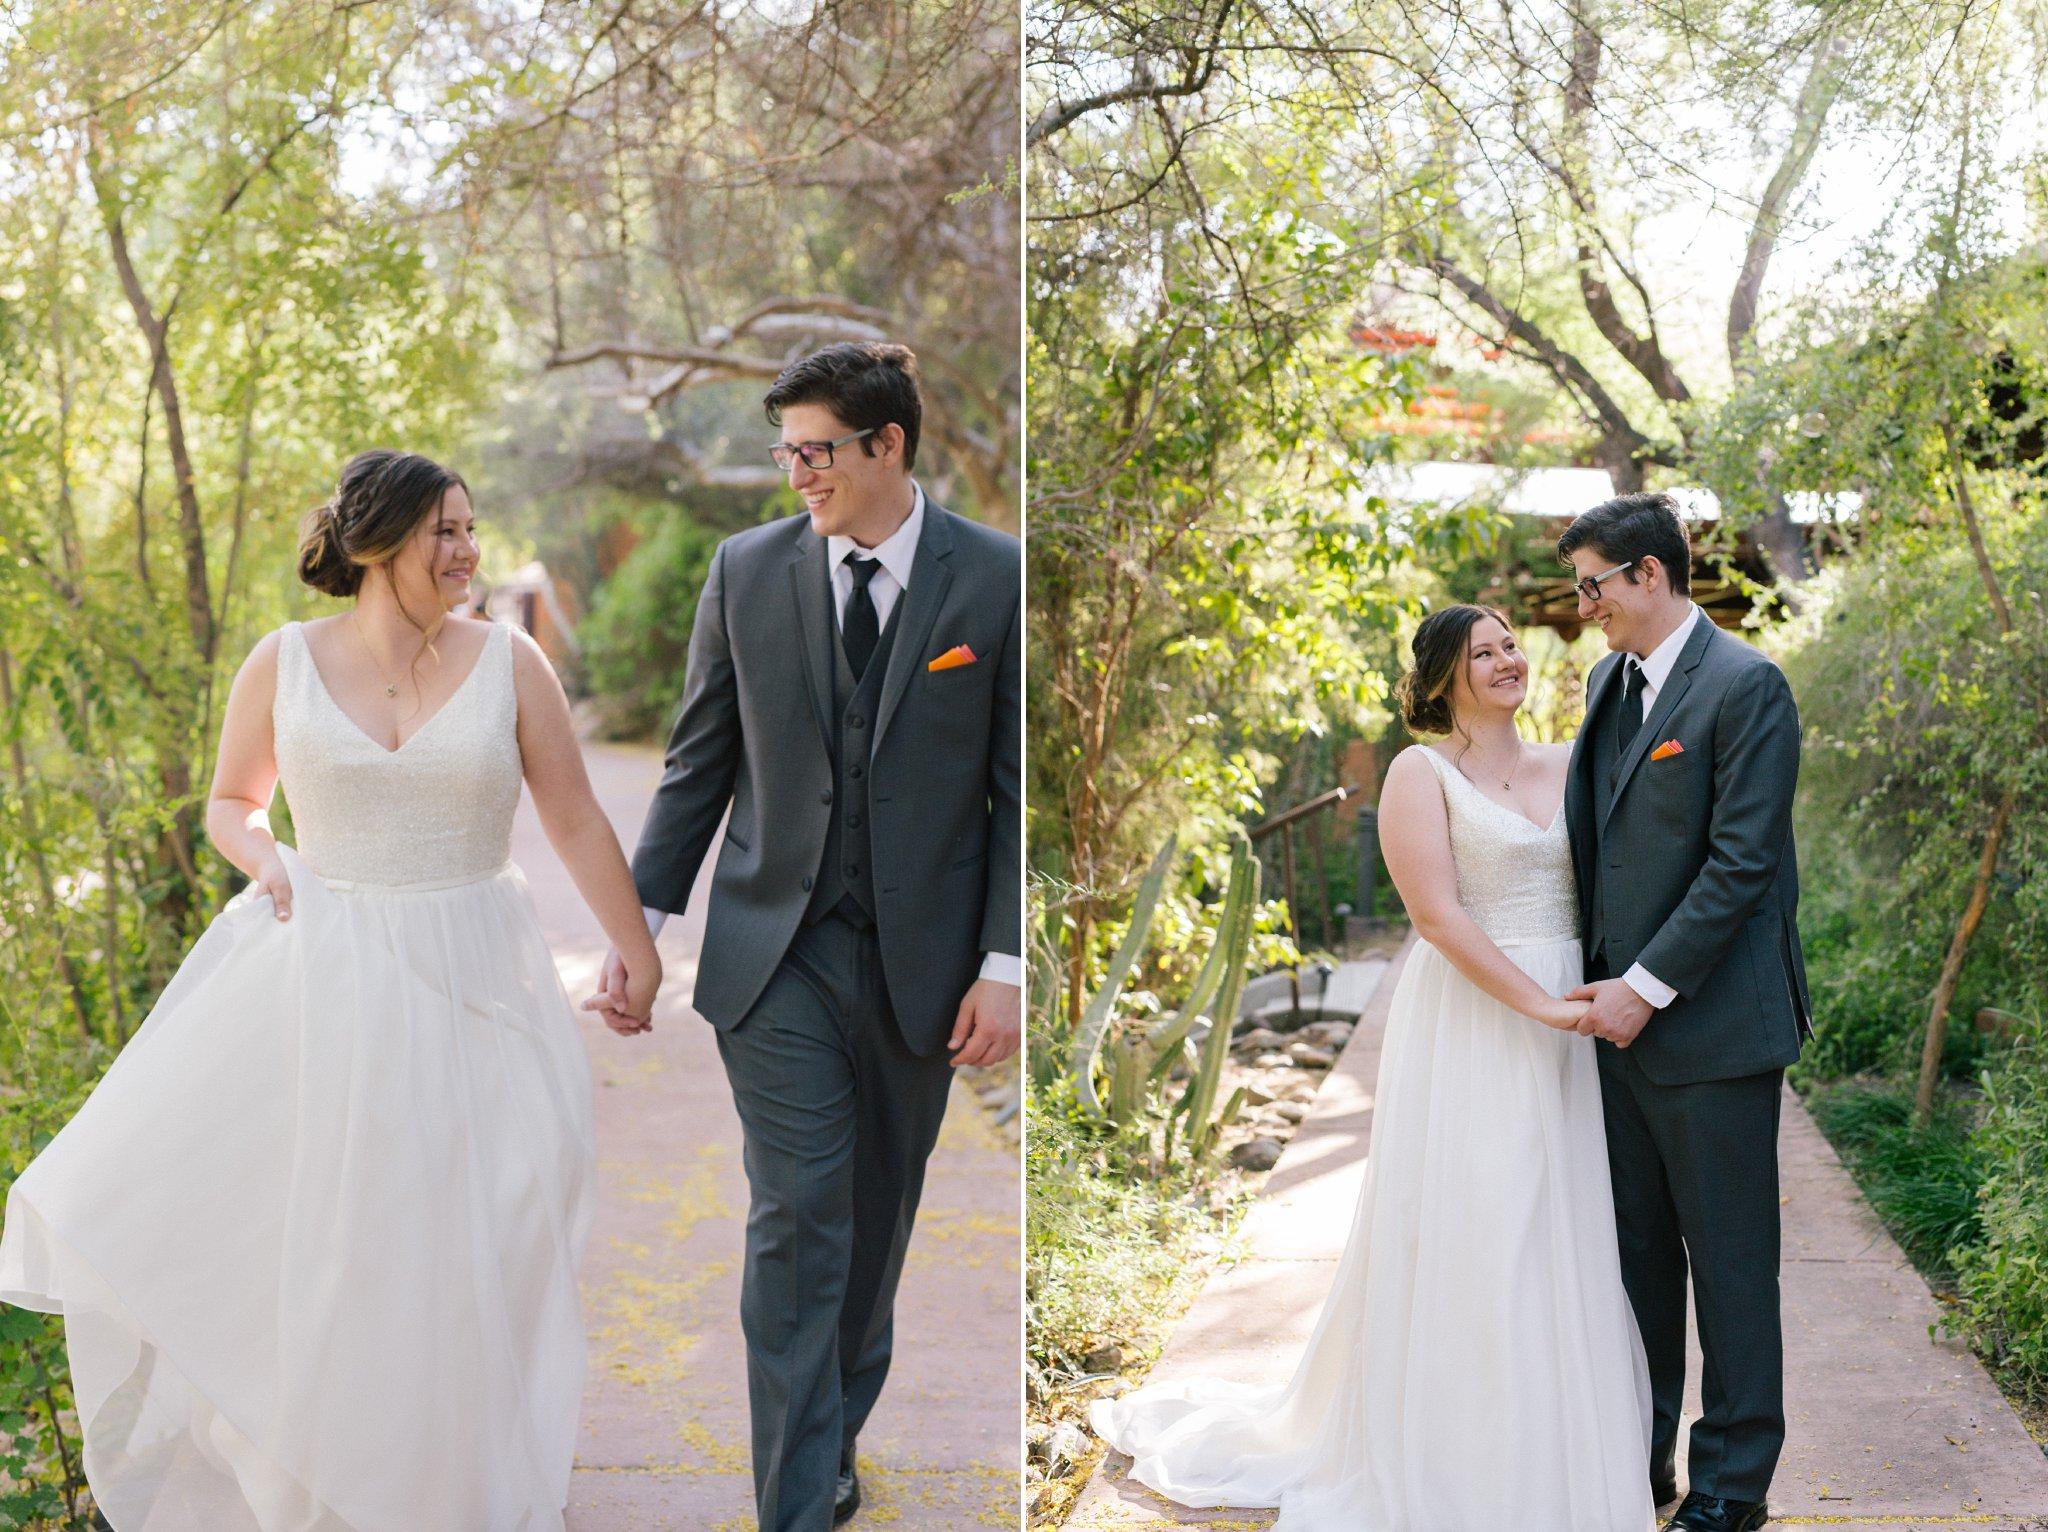 bride & groom at Phoenix Zoo wedding